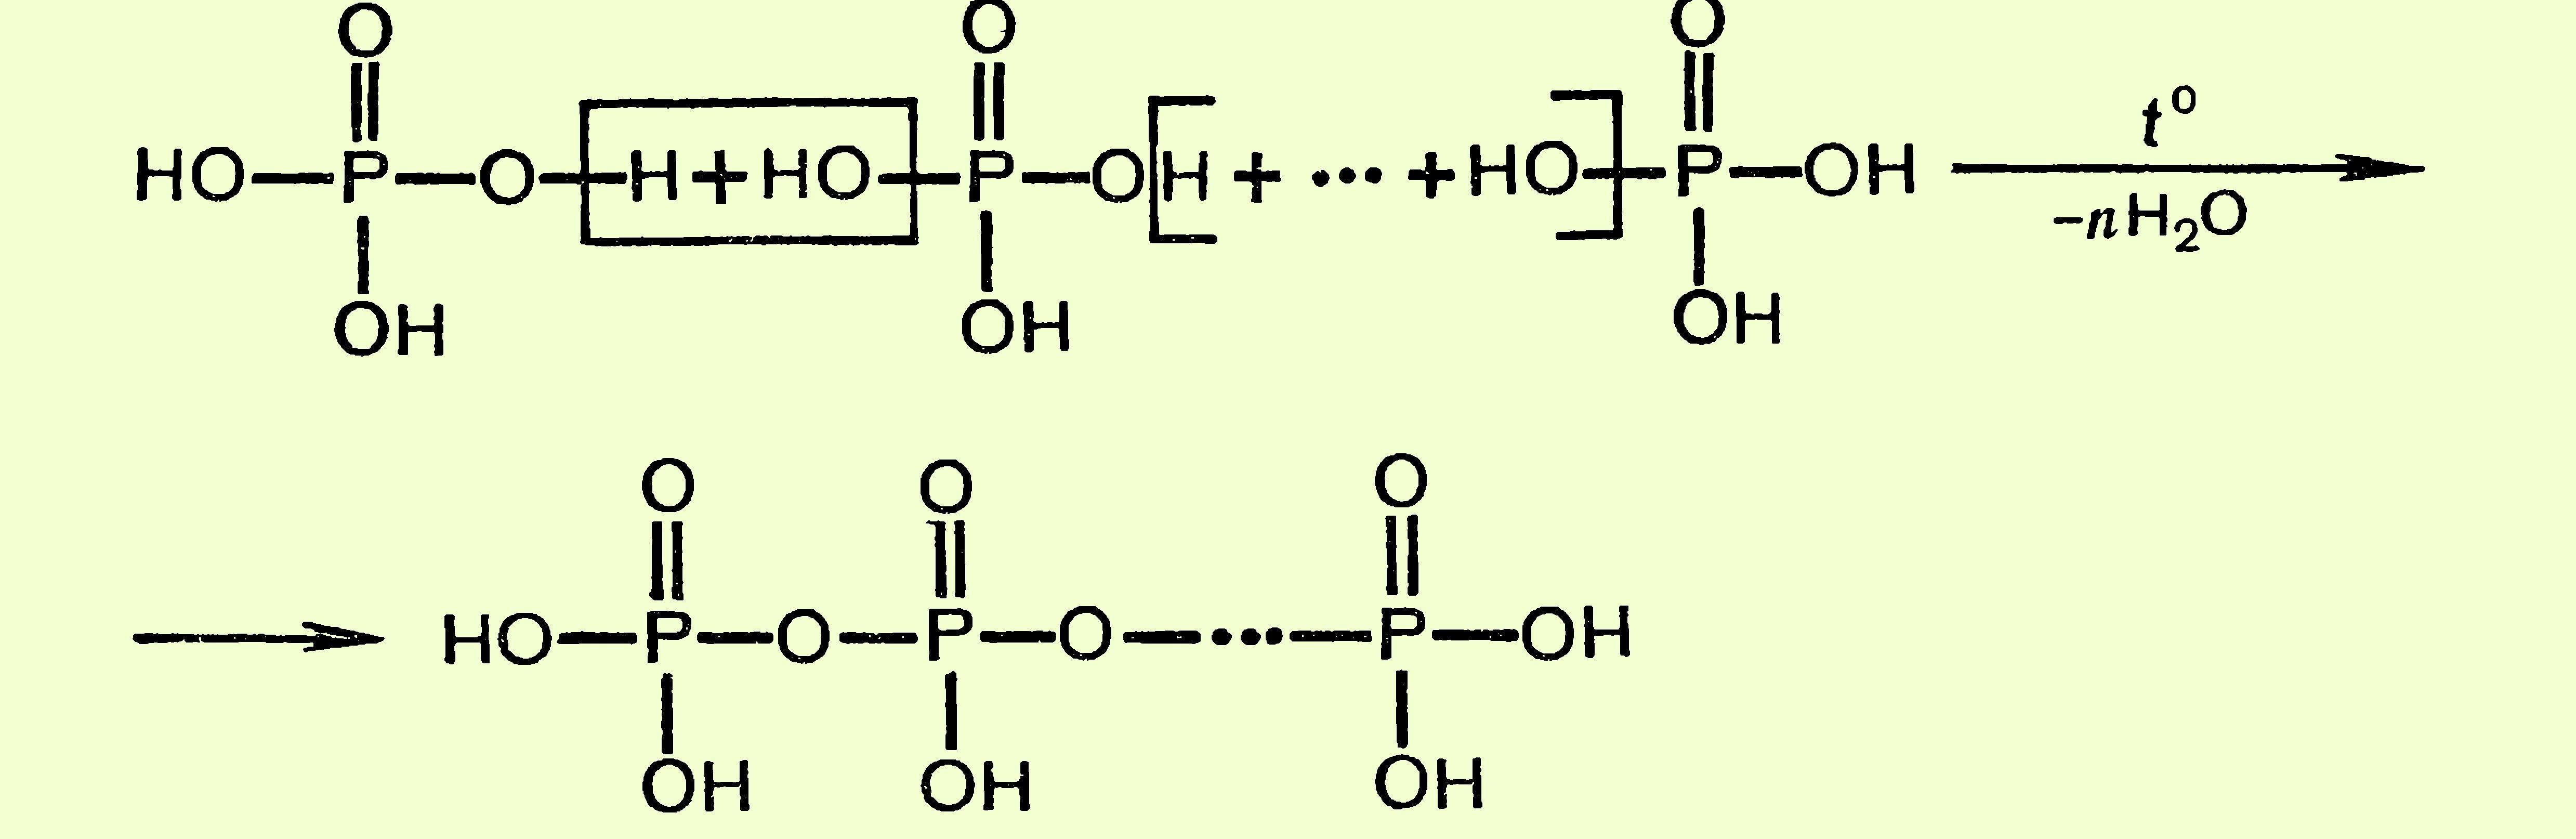 Конденсация фосфорной кислоты. Condensation of phosphoric acid